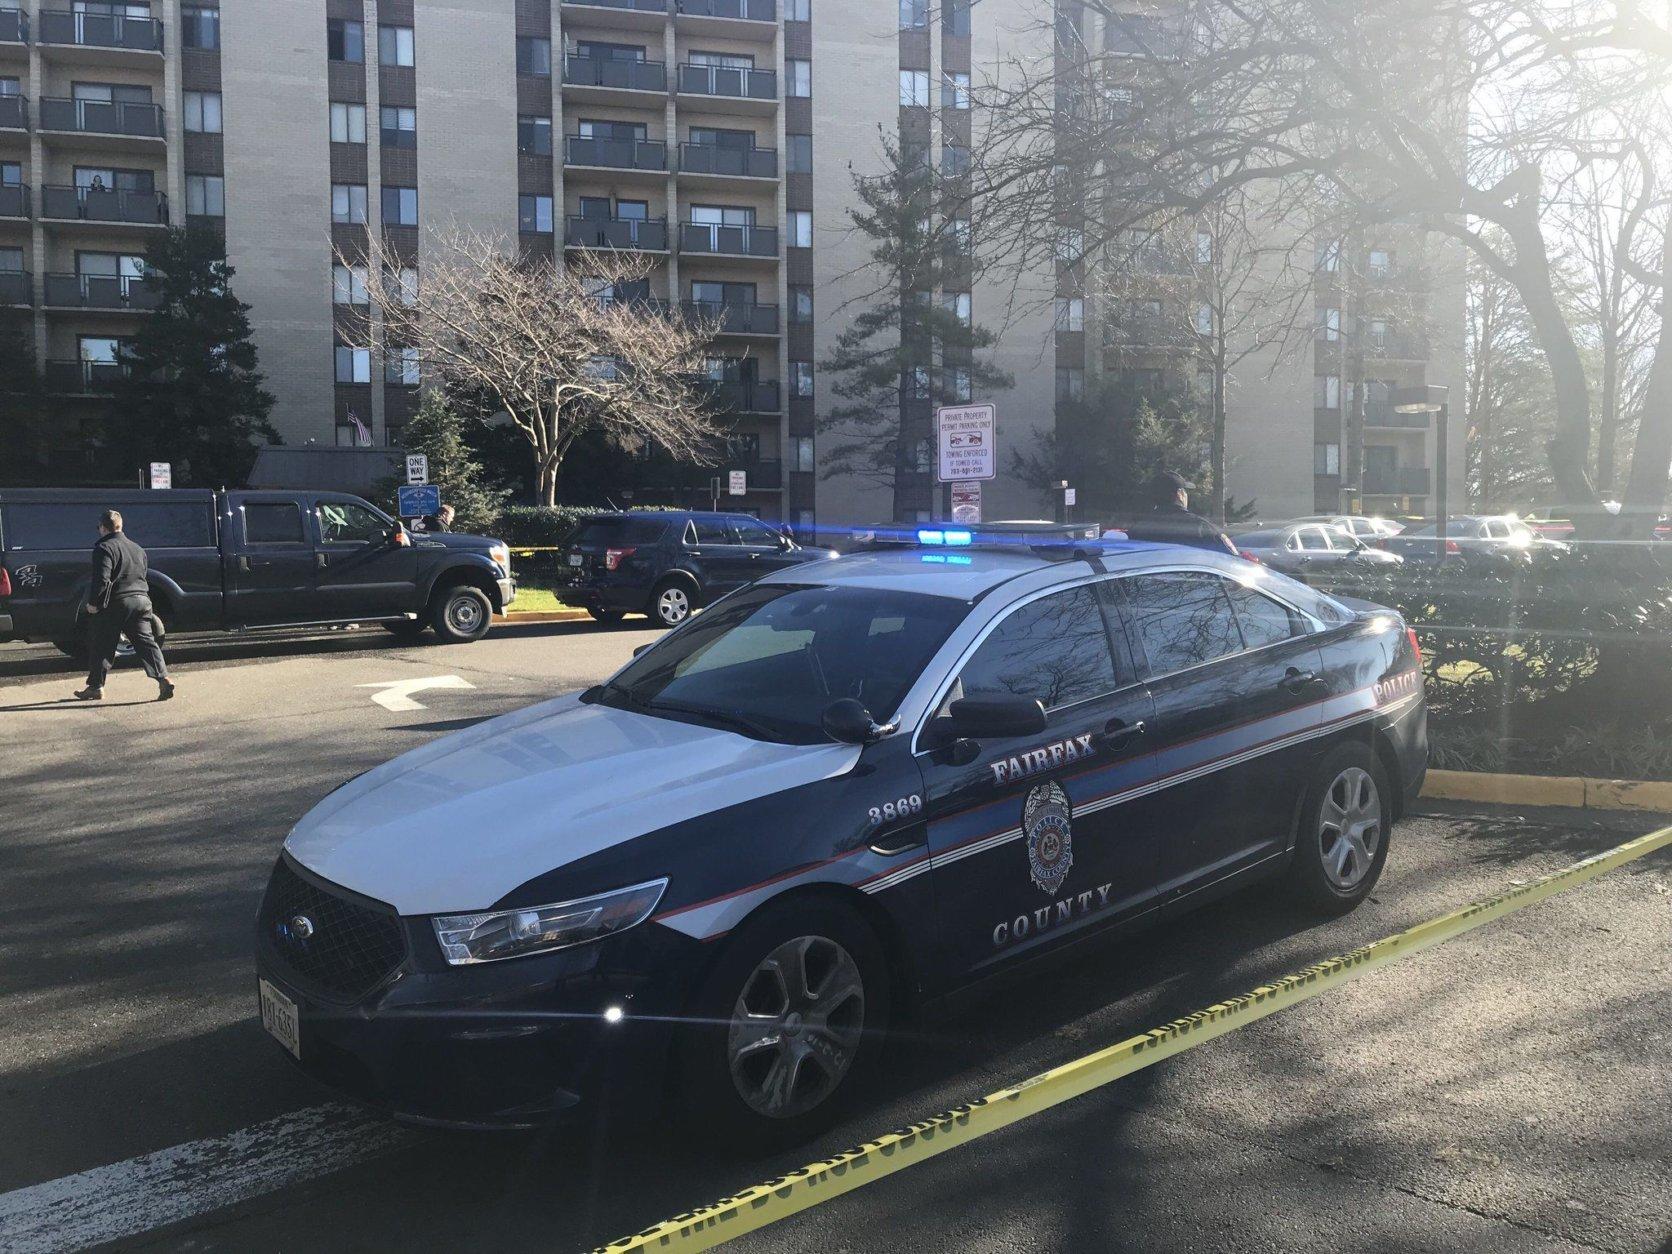 Fairfax County police on the scene where two men where shot dead Tuesday, Dec. 18, 2018. (Courtesy Fairfax County police)